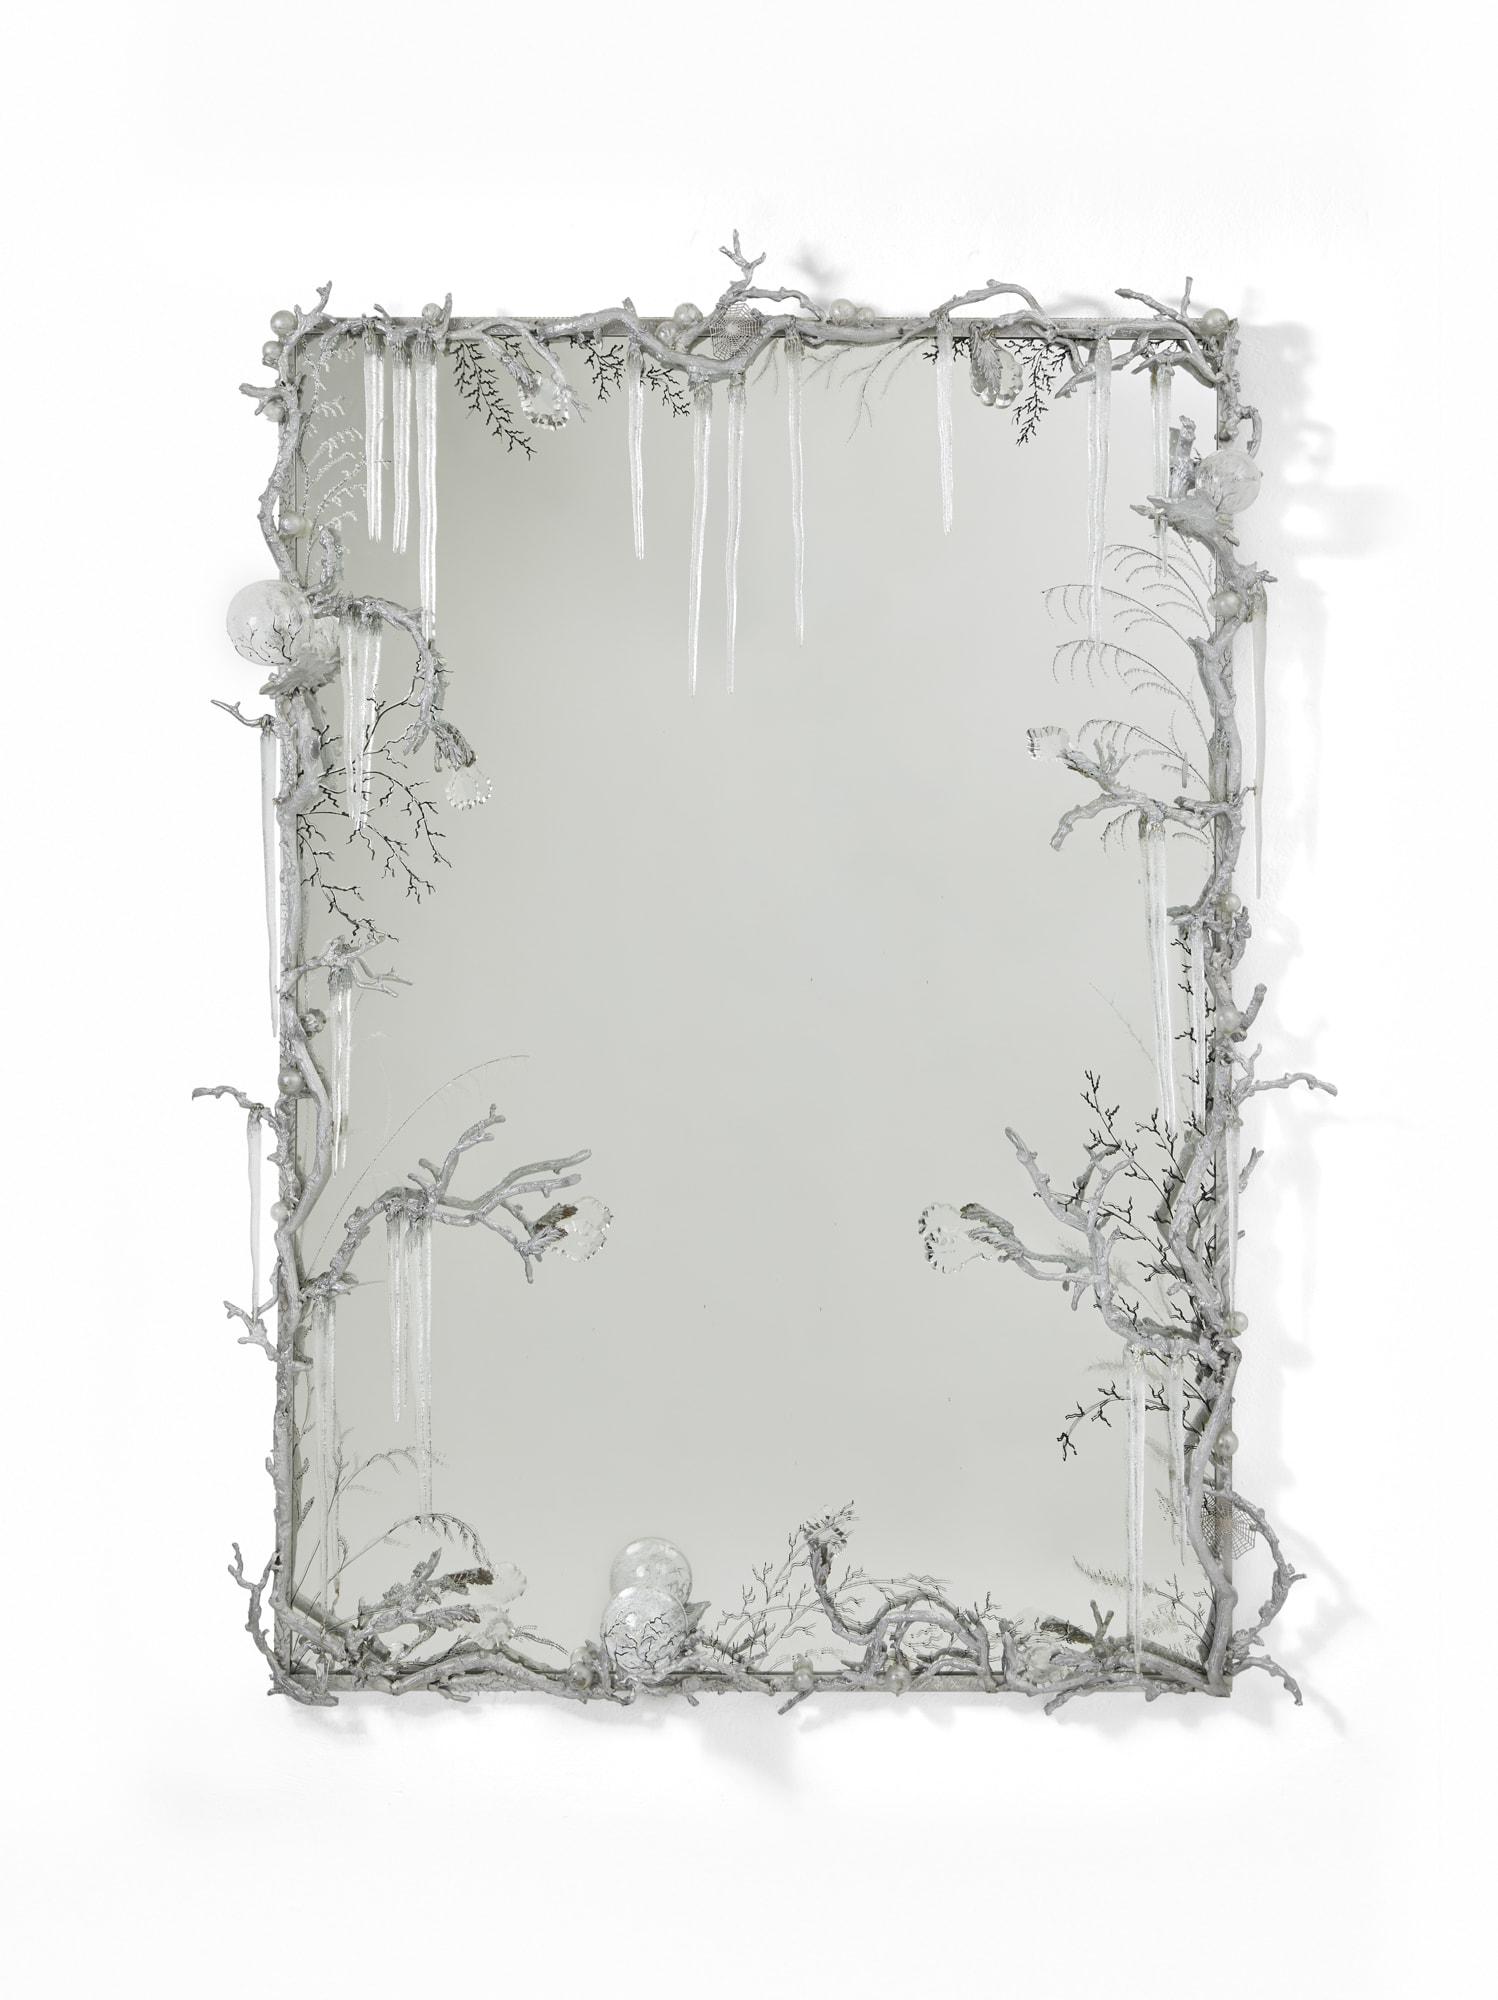 Joy de Rohan Chabot, Miroir «Matin Givré», vue 01